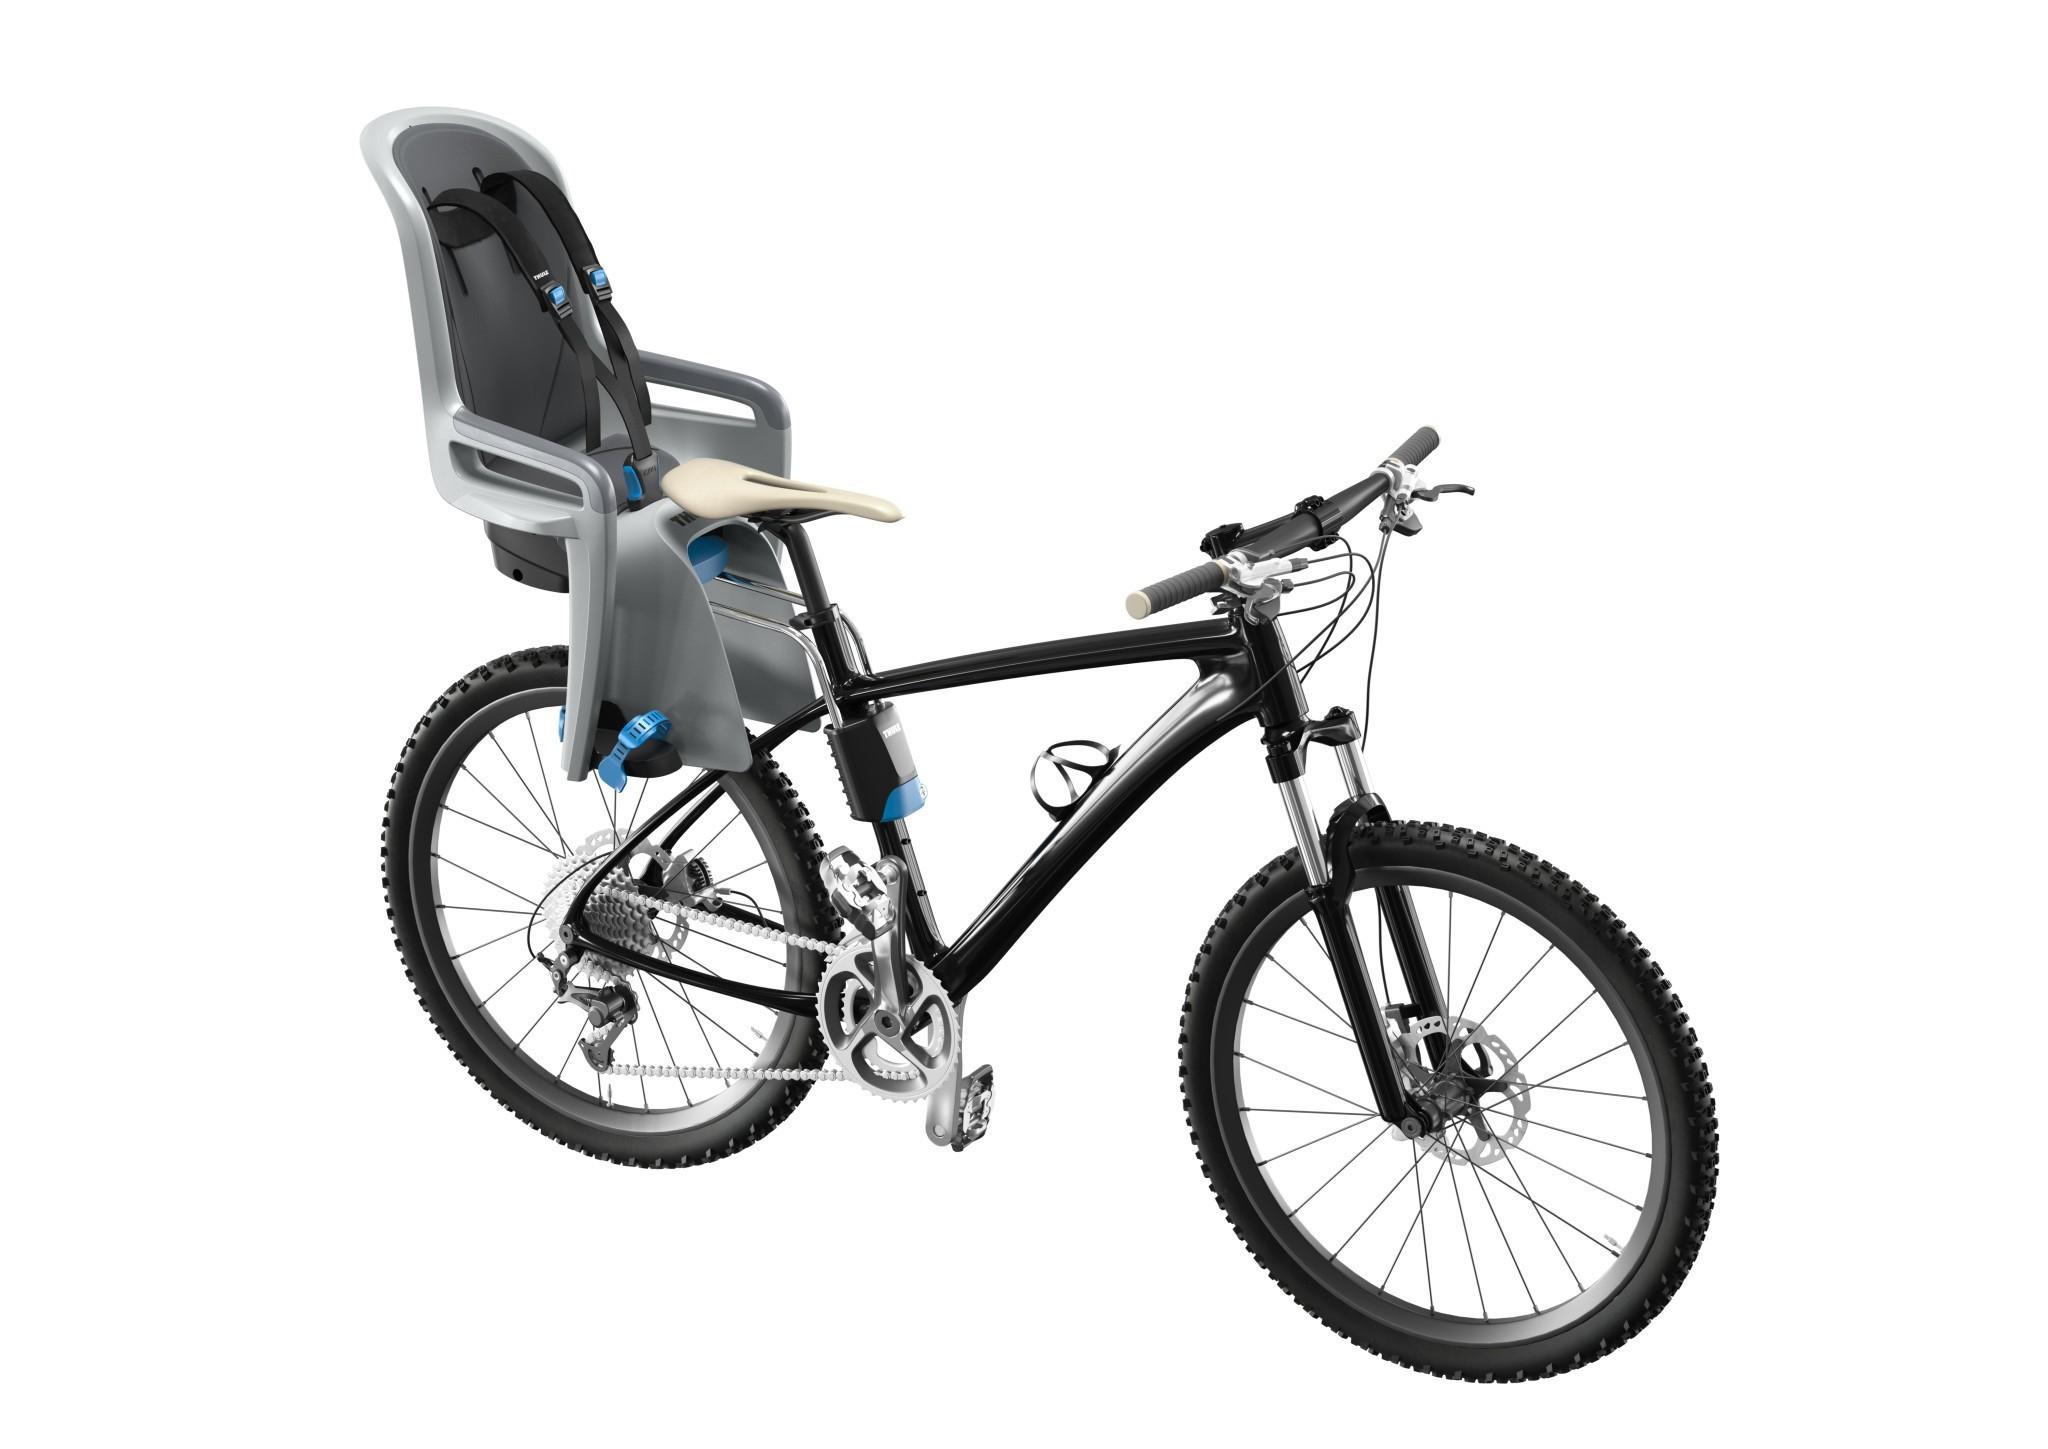 Fotelik rowerowy - THULE RideAlong - jasnoszary